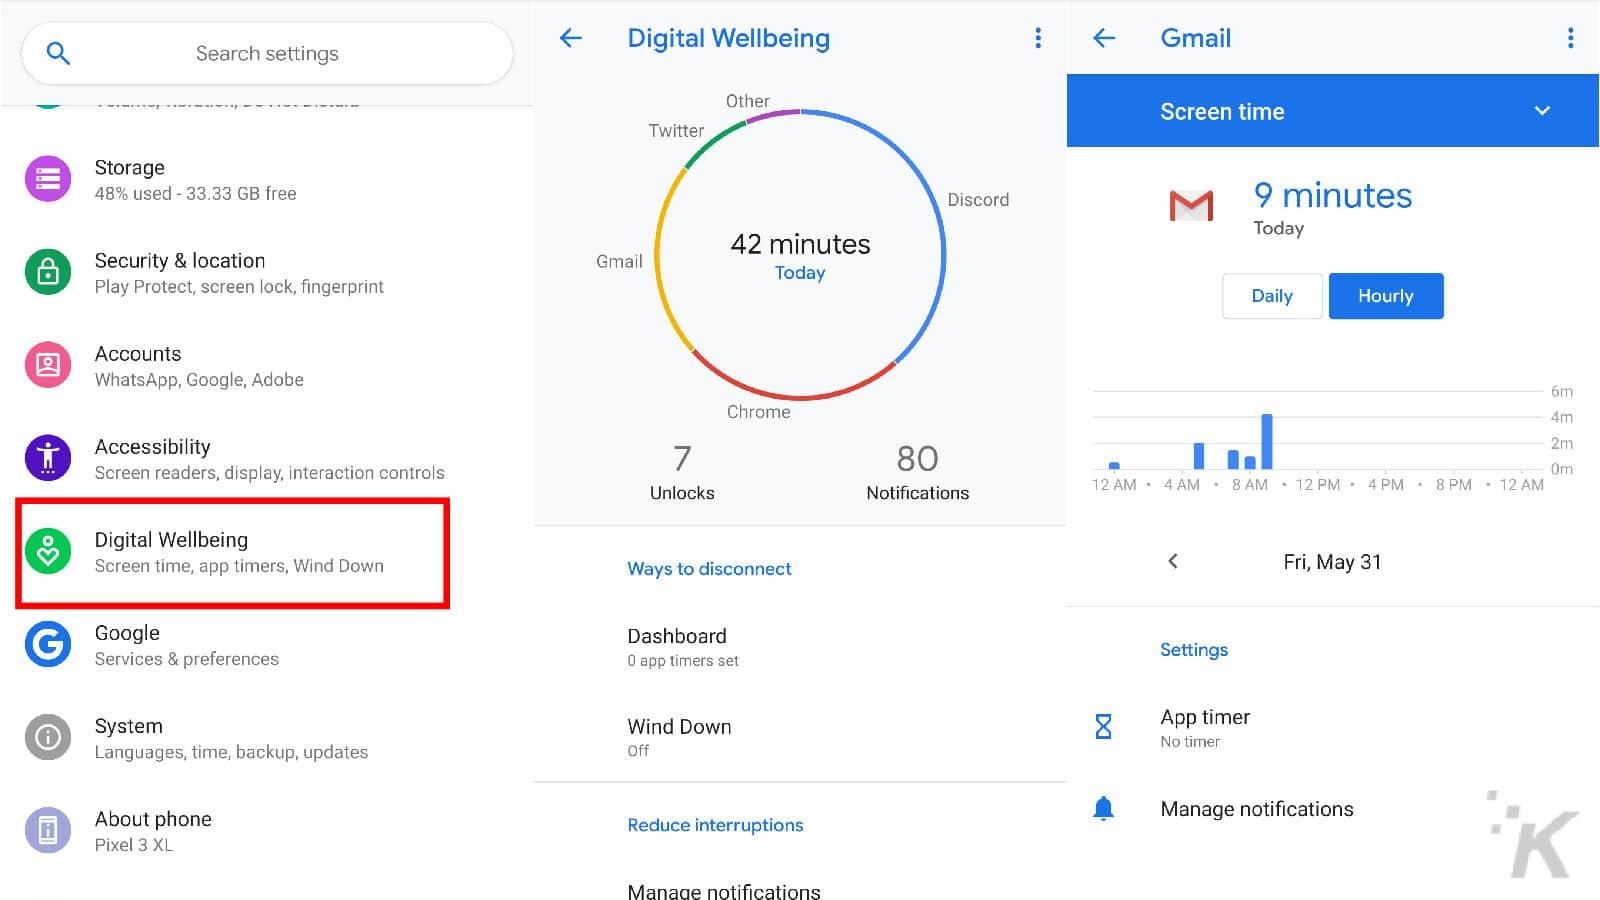 digital wellbeing app on google pixel devices